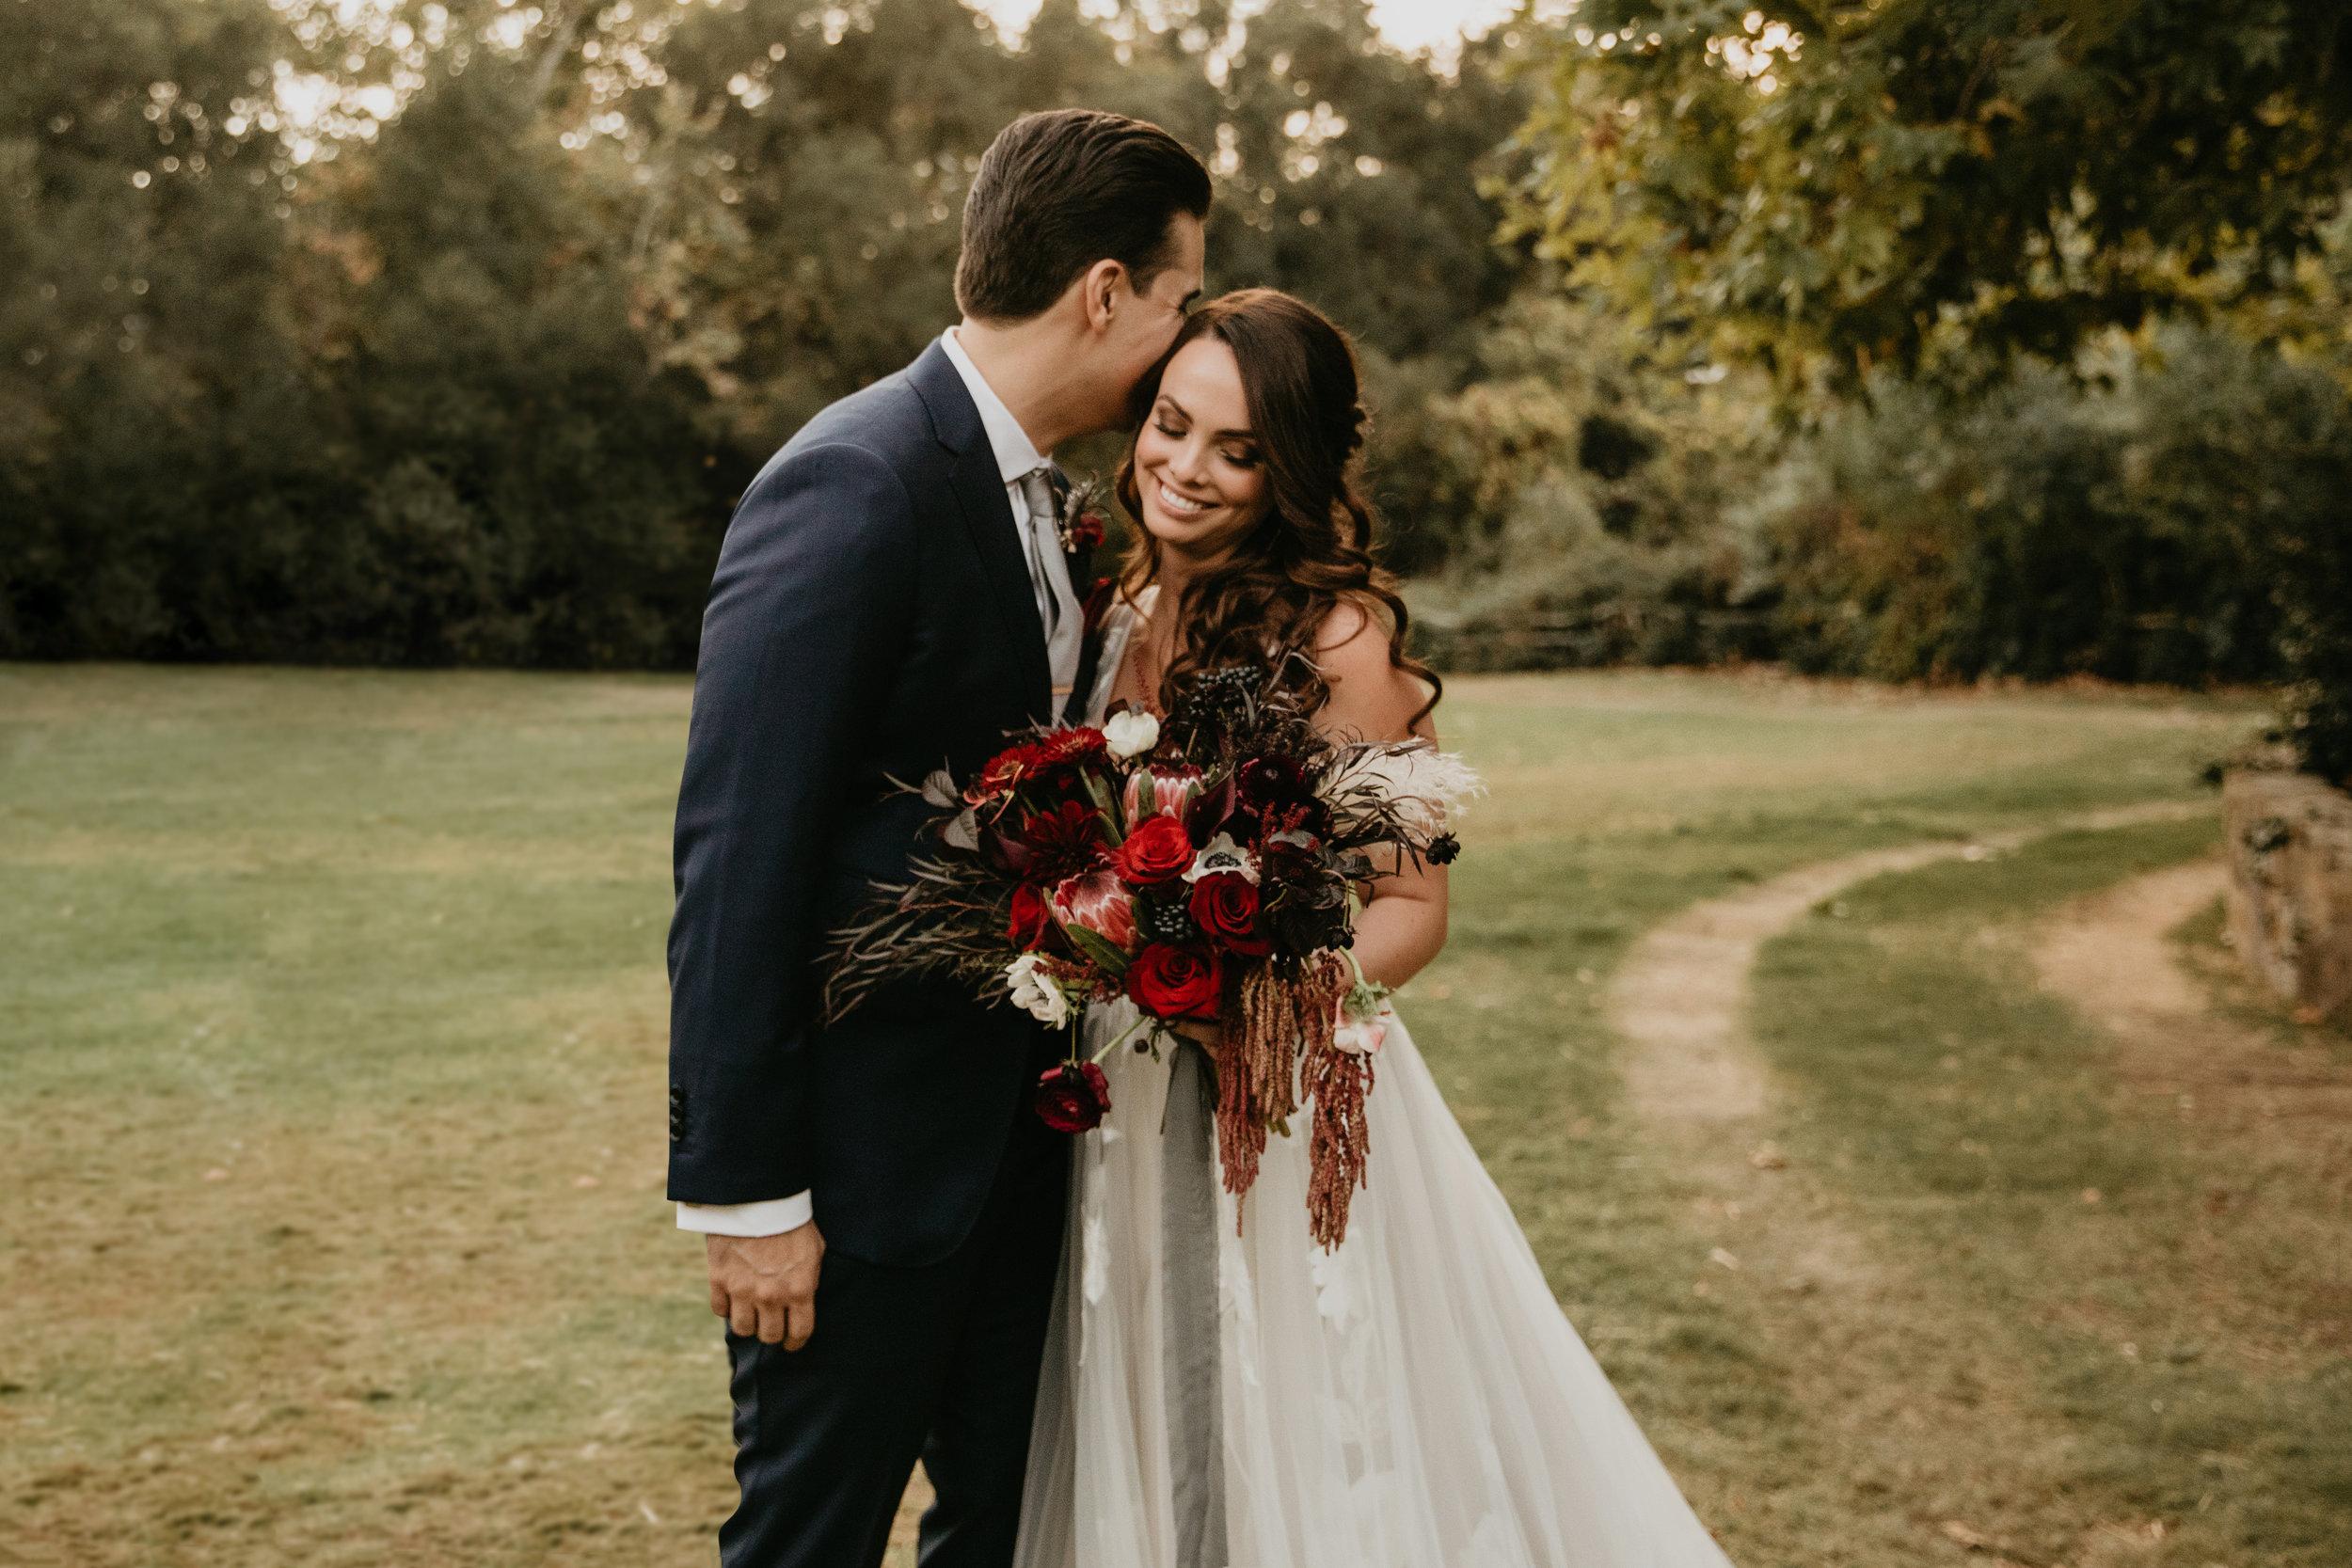 Lauren-and-John-Wedding-At-Calamigos-Ranch-Kadi-Tobin0591.jpg